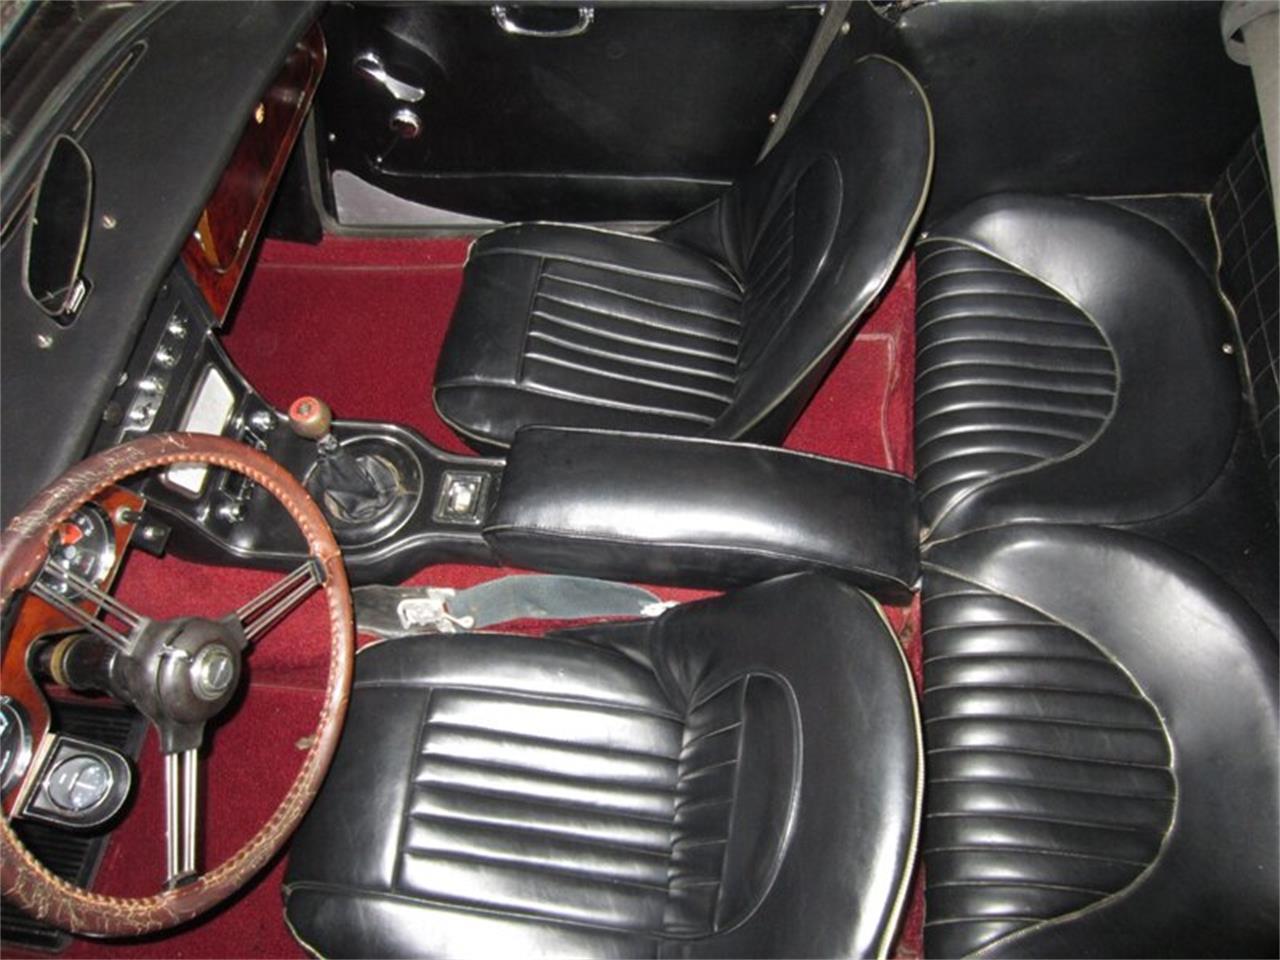 1967 Austin-Healey 3000 (CC-1293132) for sale in Delray Beach, Florida